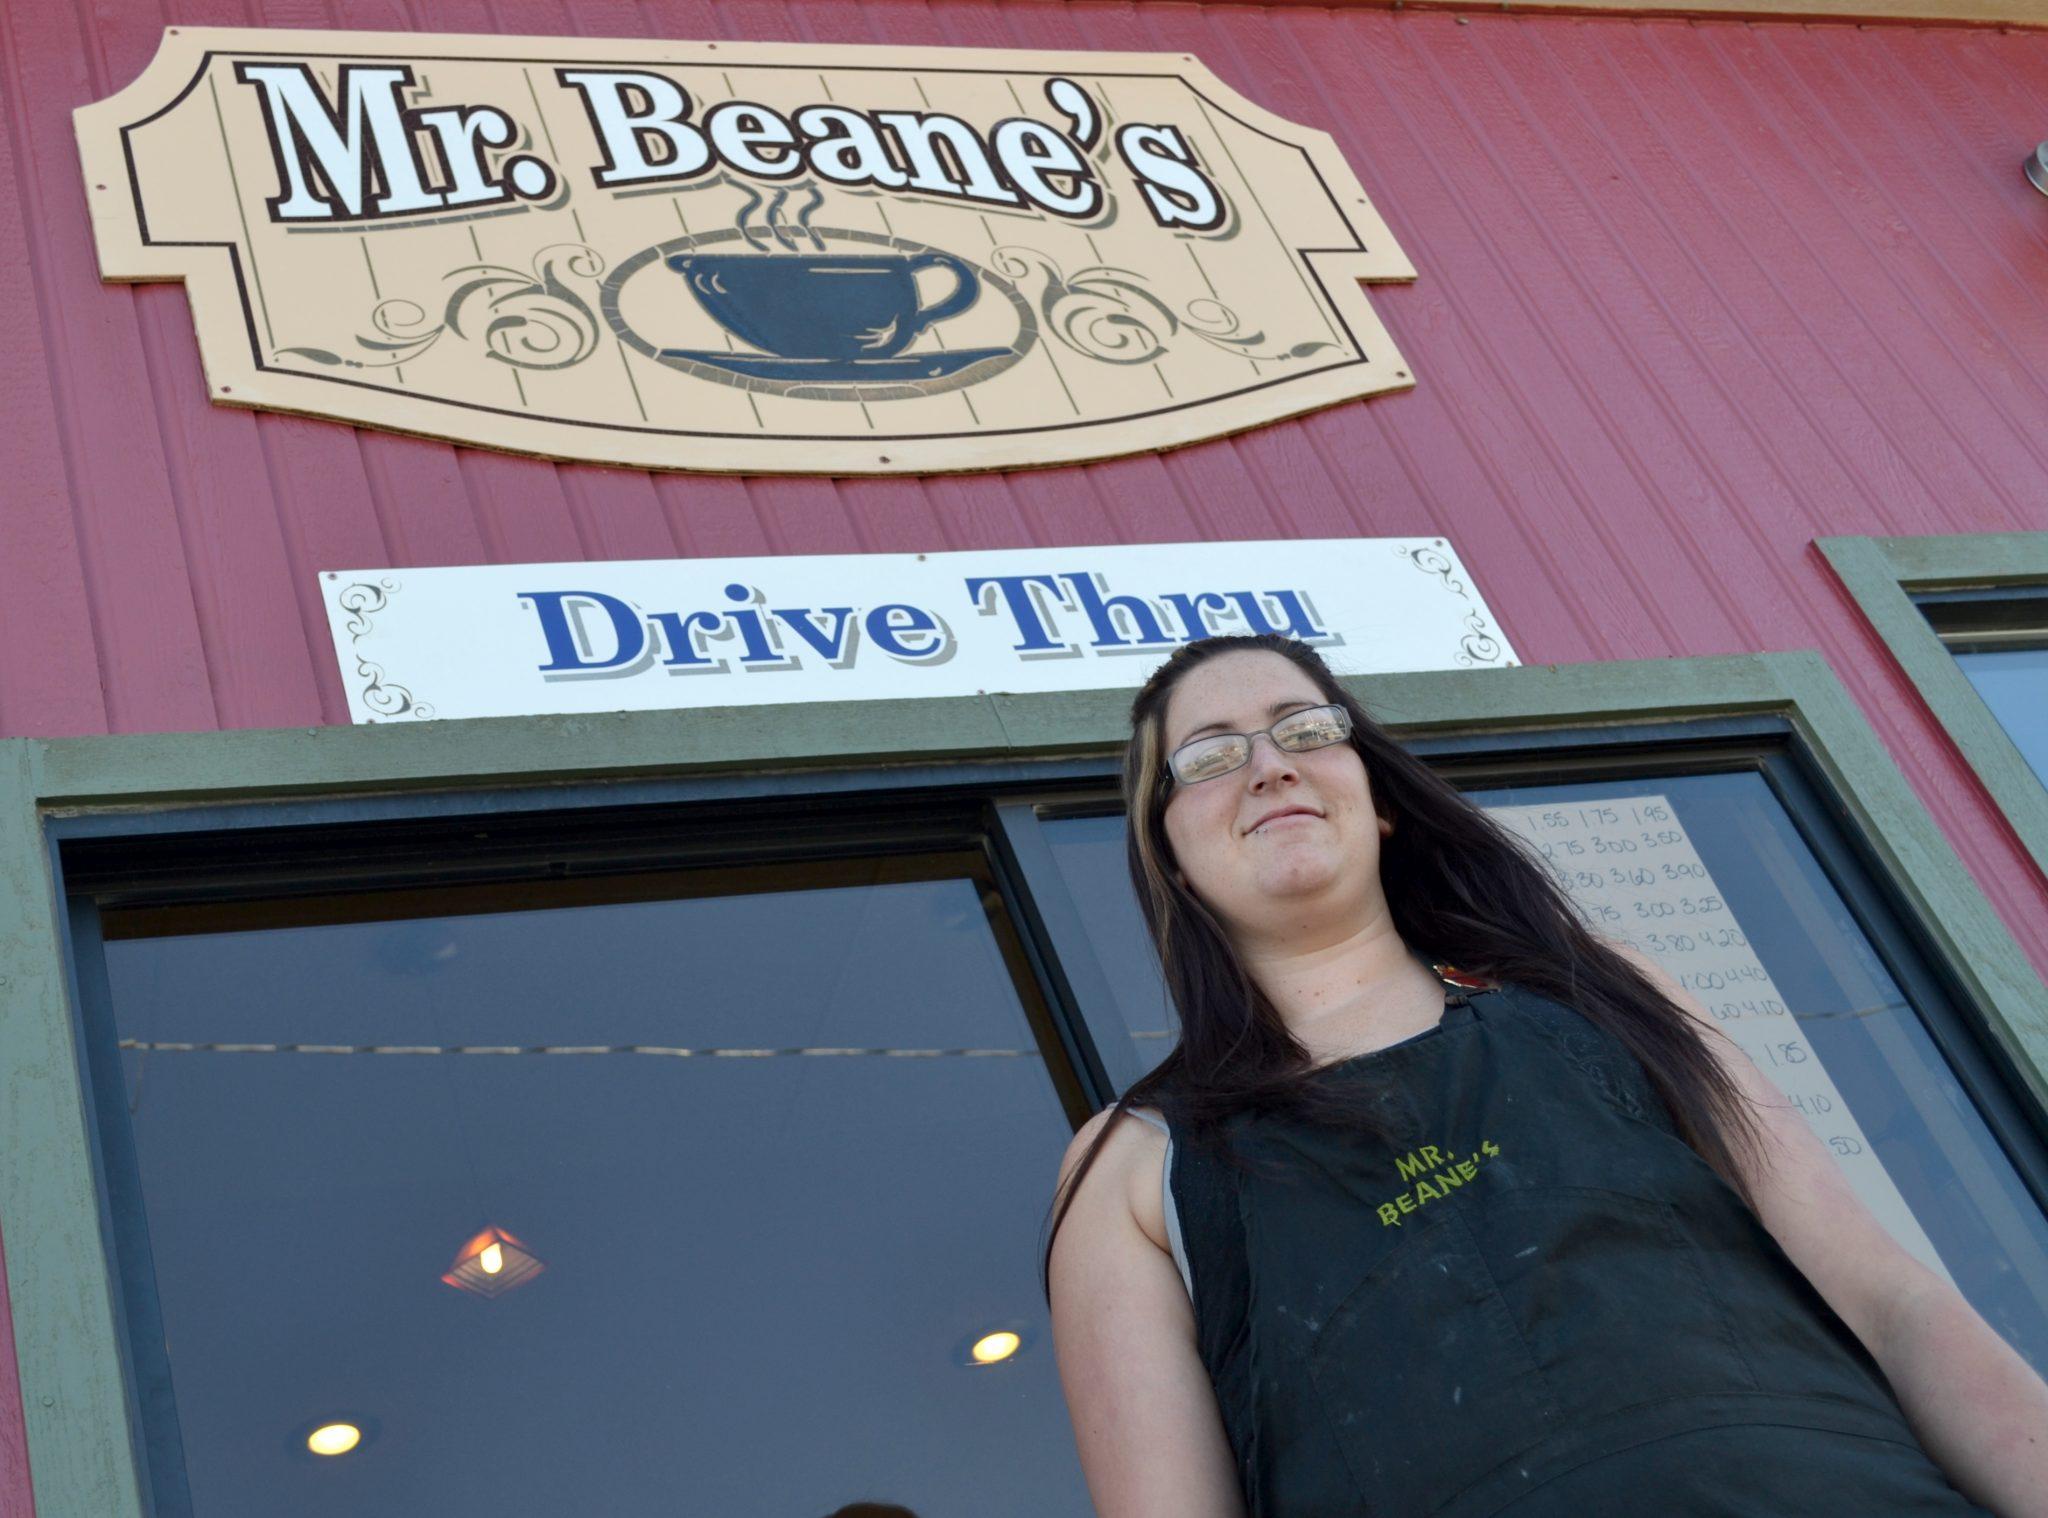 Mr. Beane's reopens under new operator